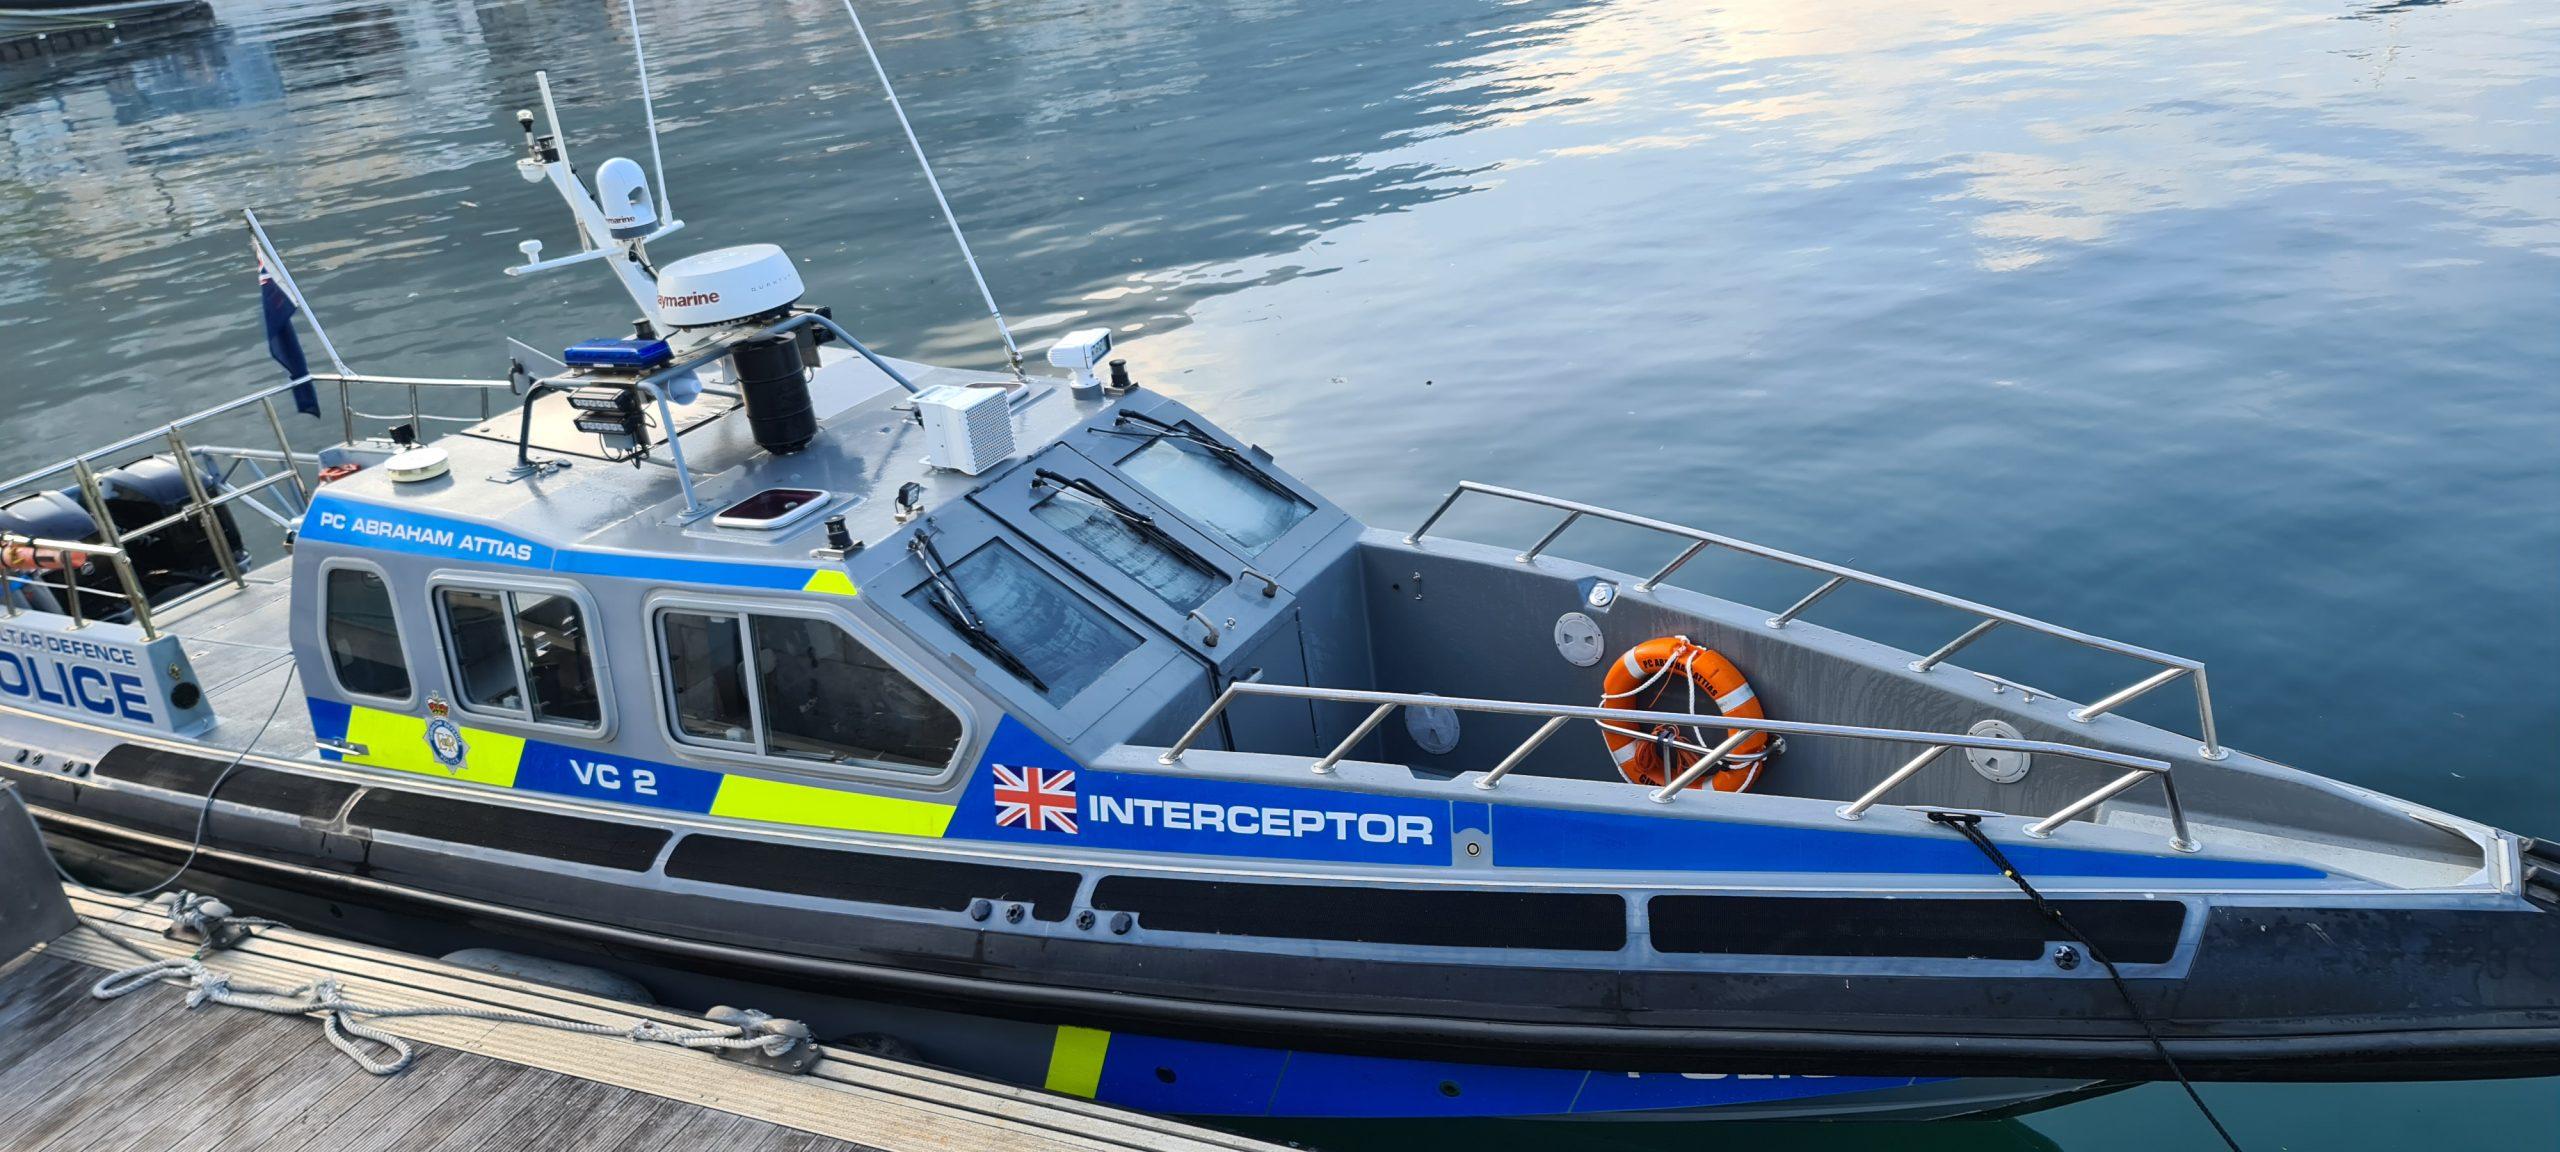 AHD M-115 on Interceptor vessel Acoustic Hailing Device on boat ship